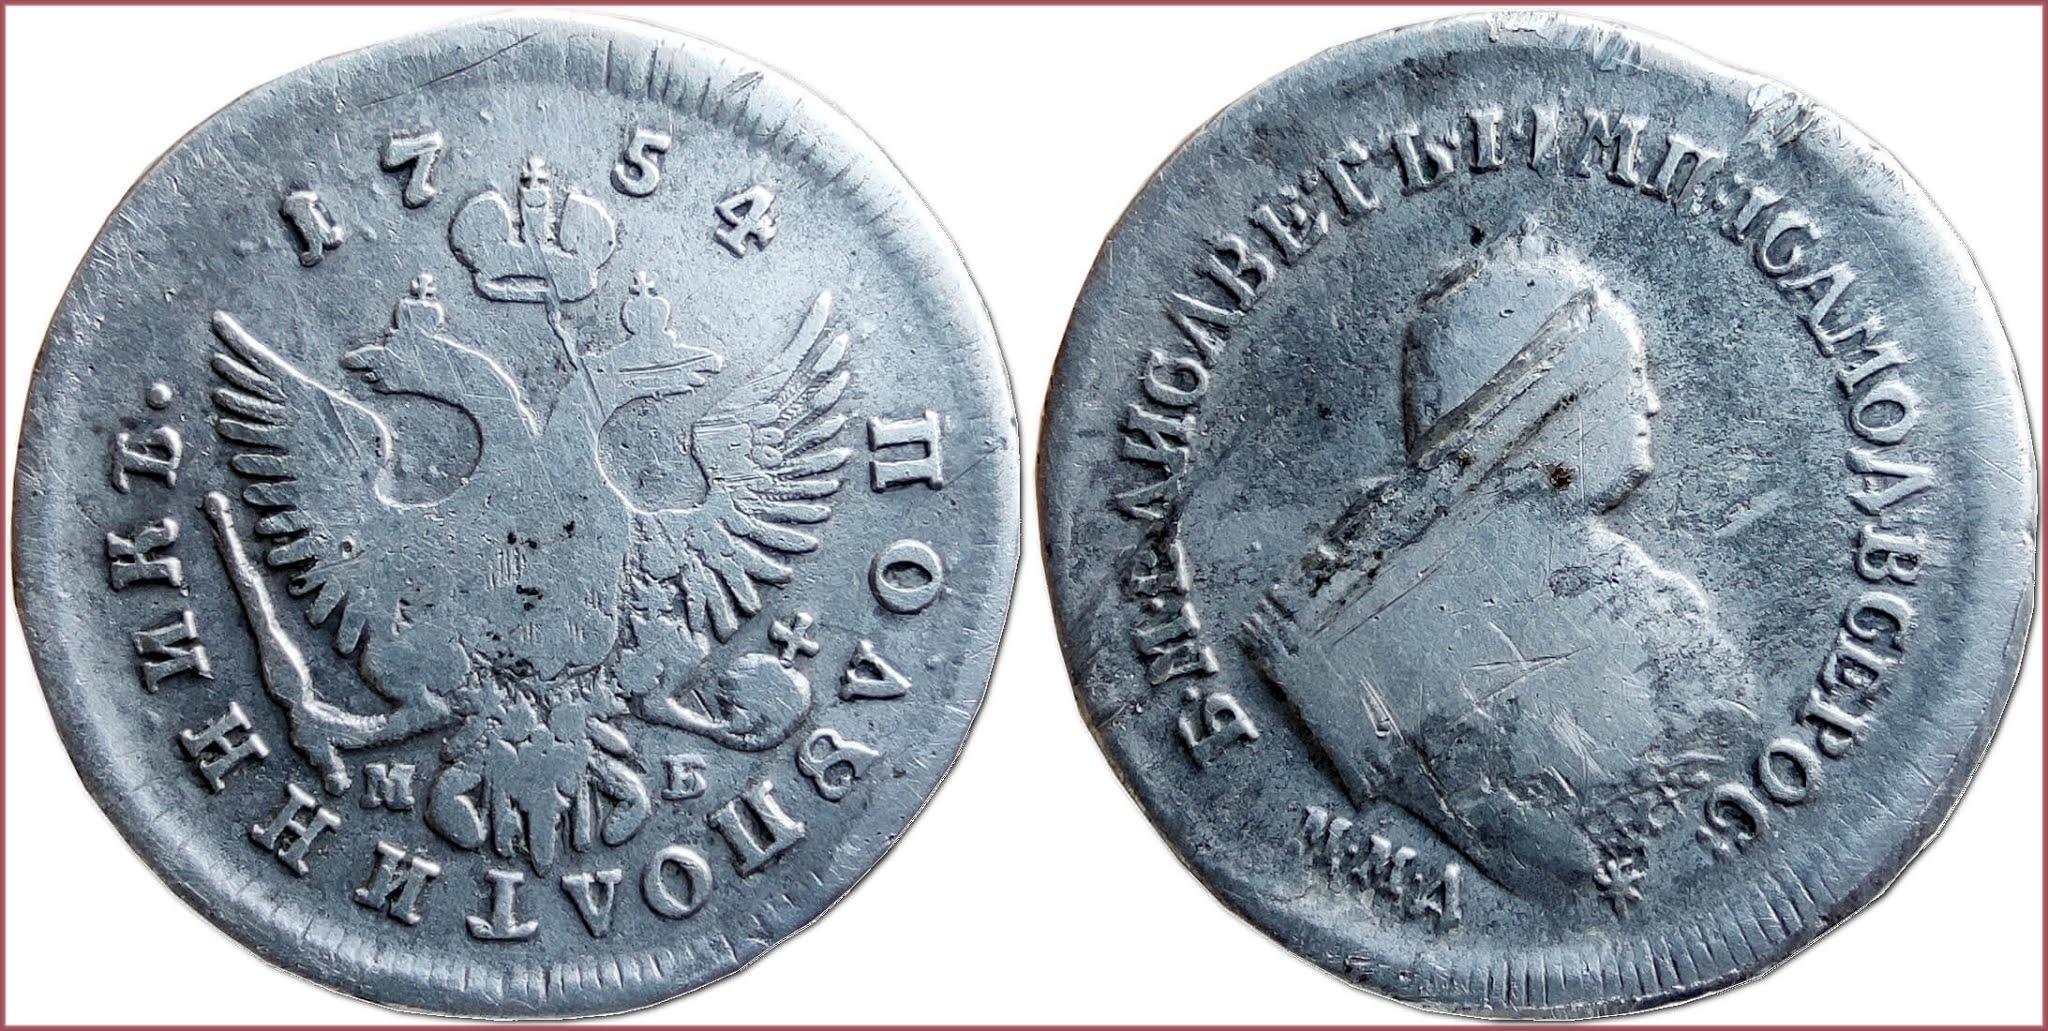 Polupoltinnik (Полуполтинник), 1754: Russian Empire